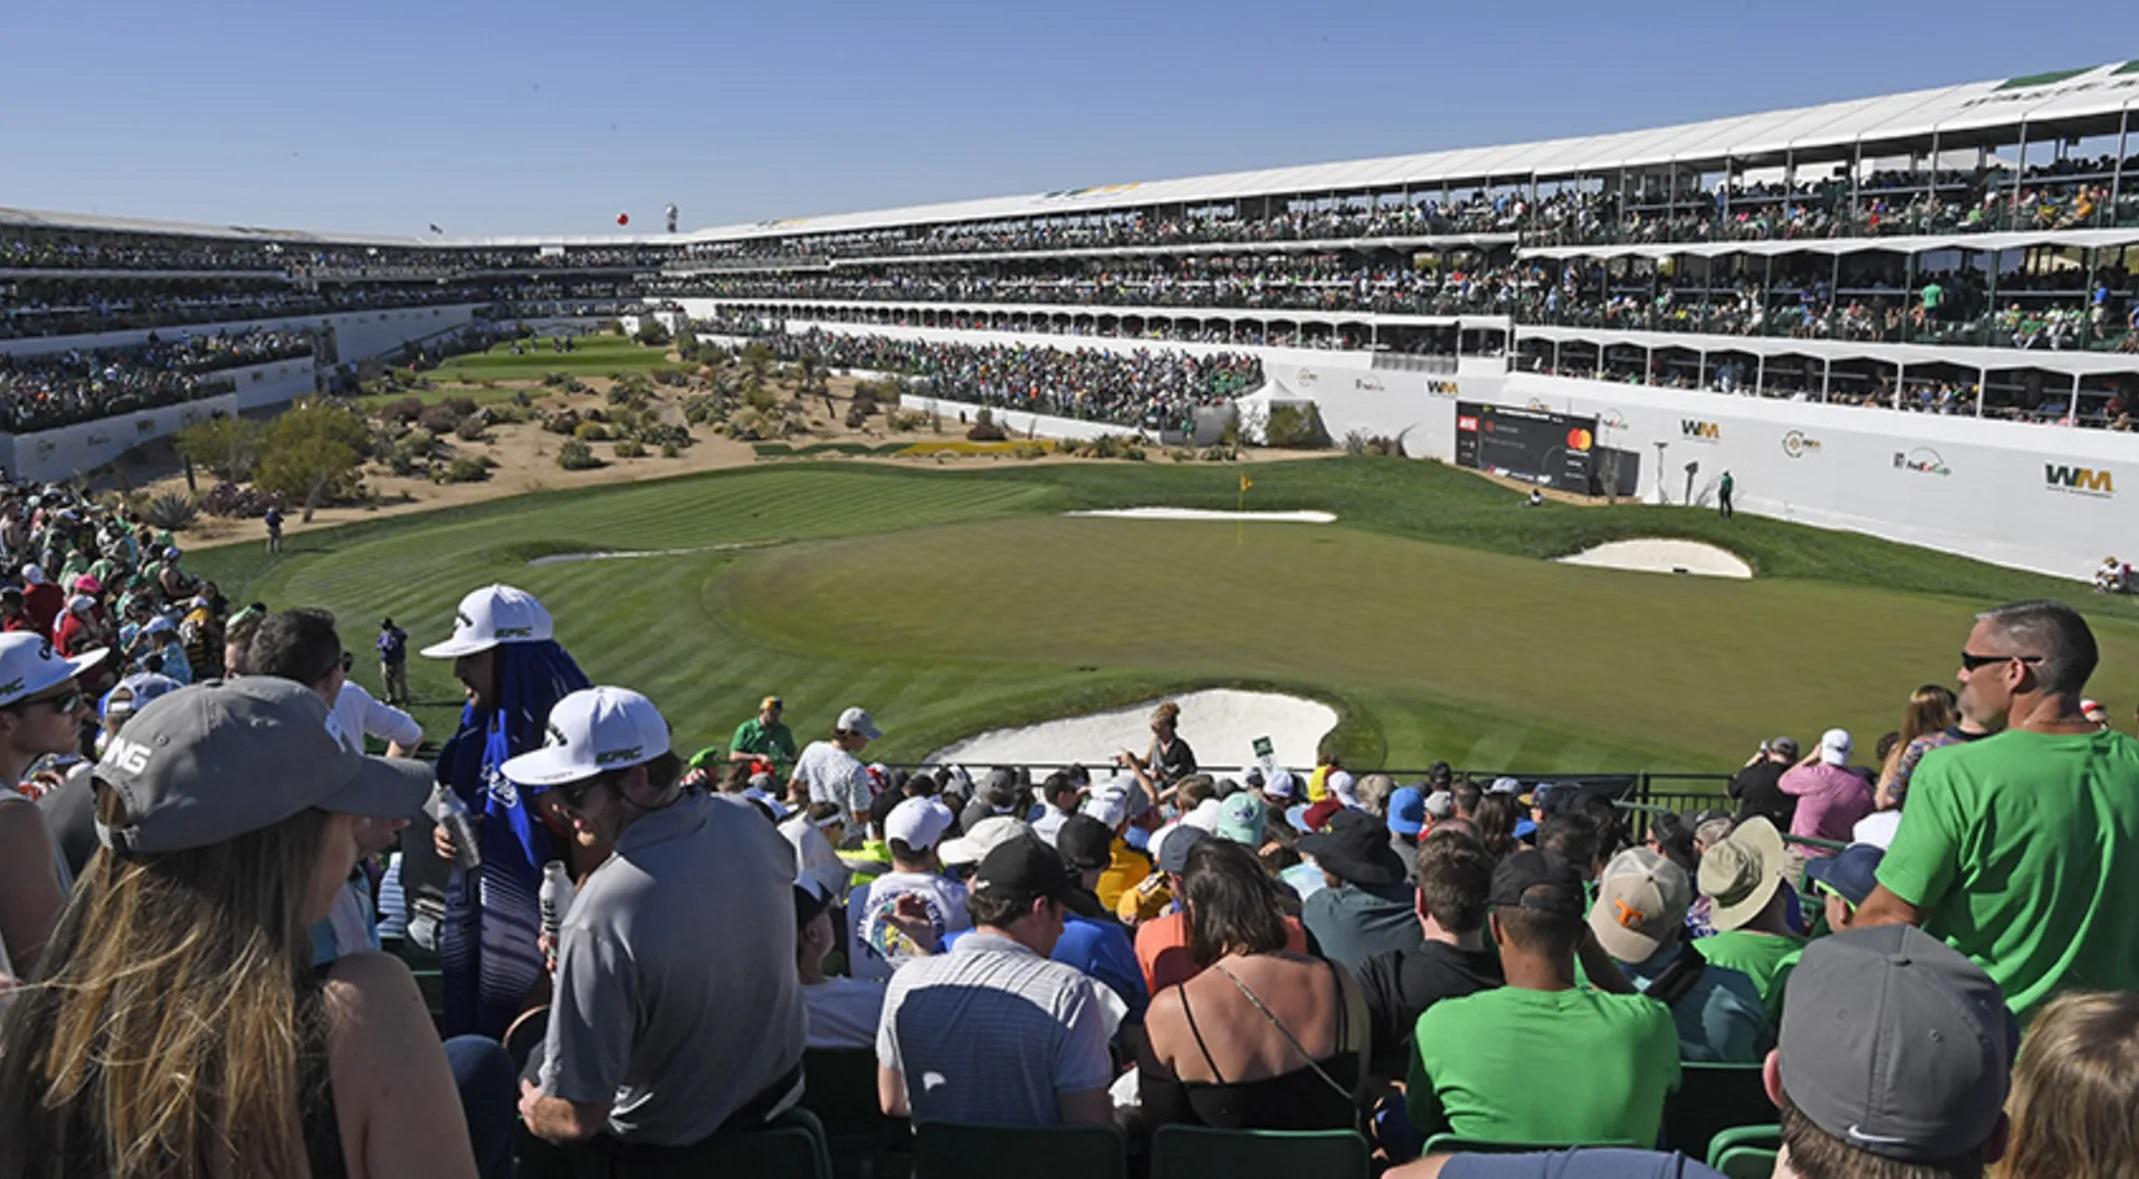 Open golf 2021 betting calculator larry robinson stats plus minus betting